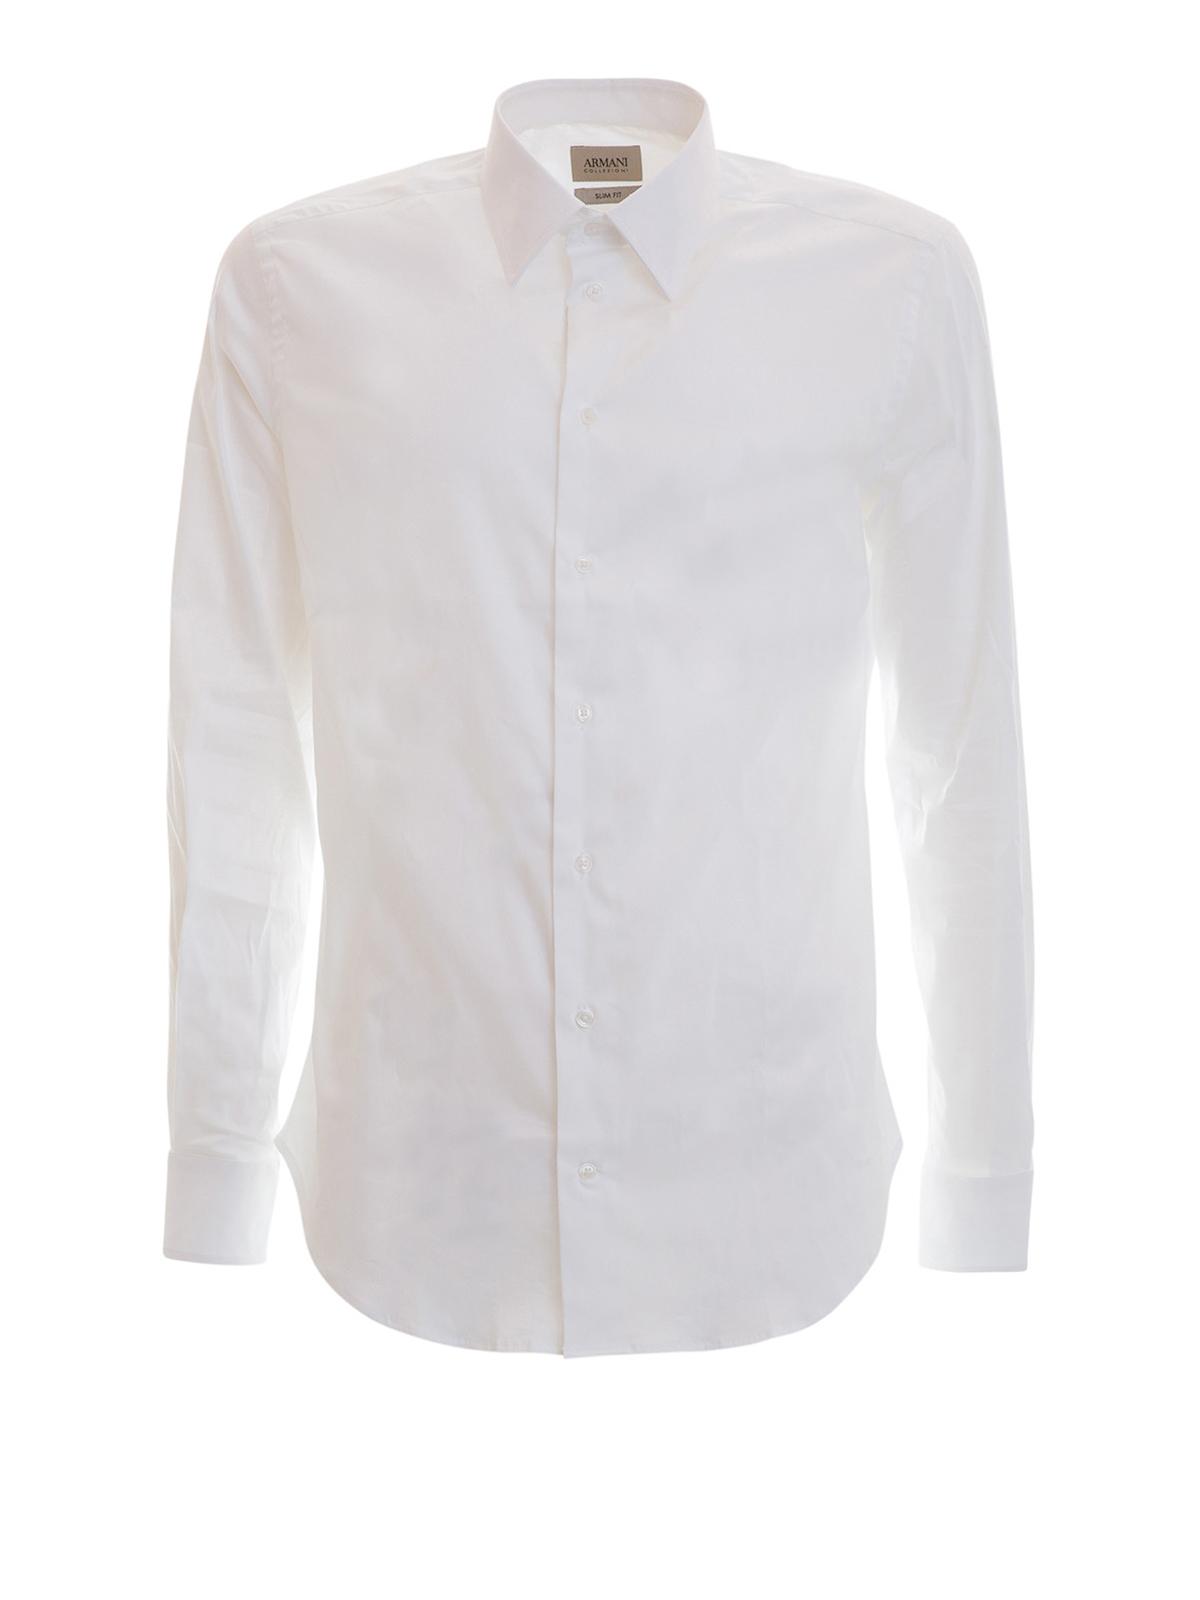 d5b07324440c Armani Collezioni - Camisa Blanca Para Hombre - Camisas - VCCS5LVCBC0100